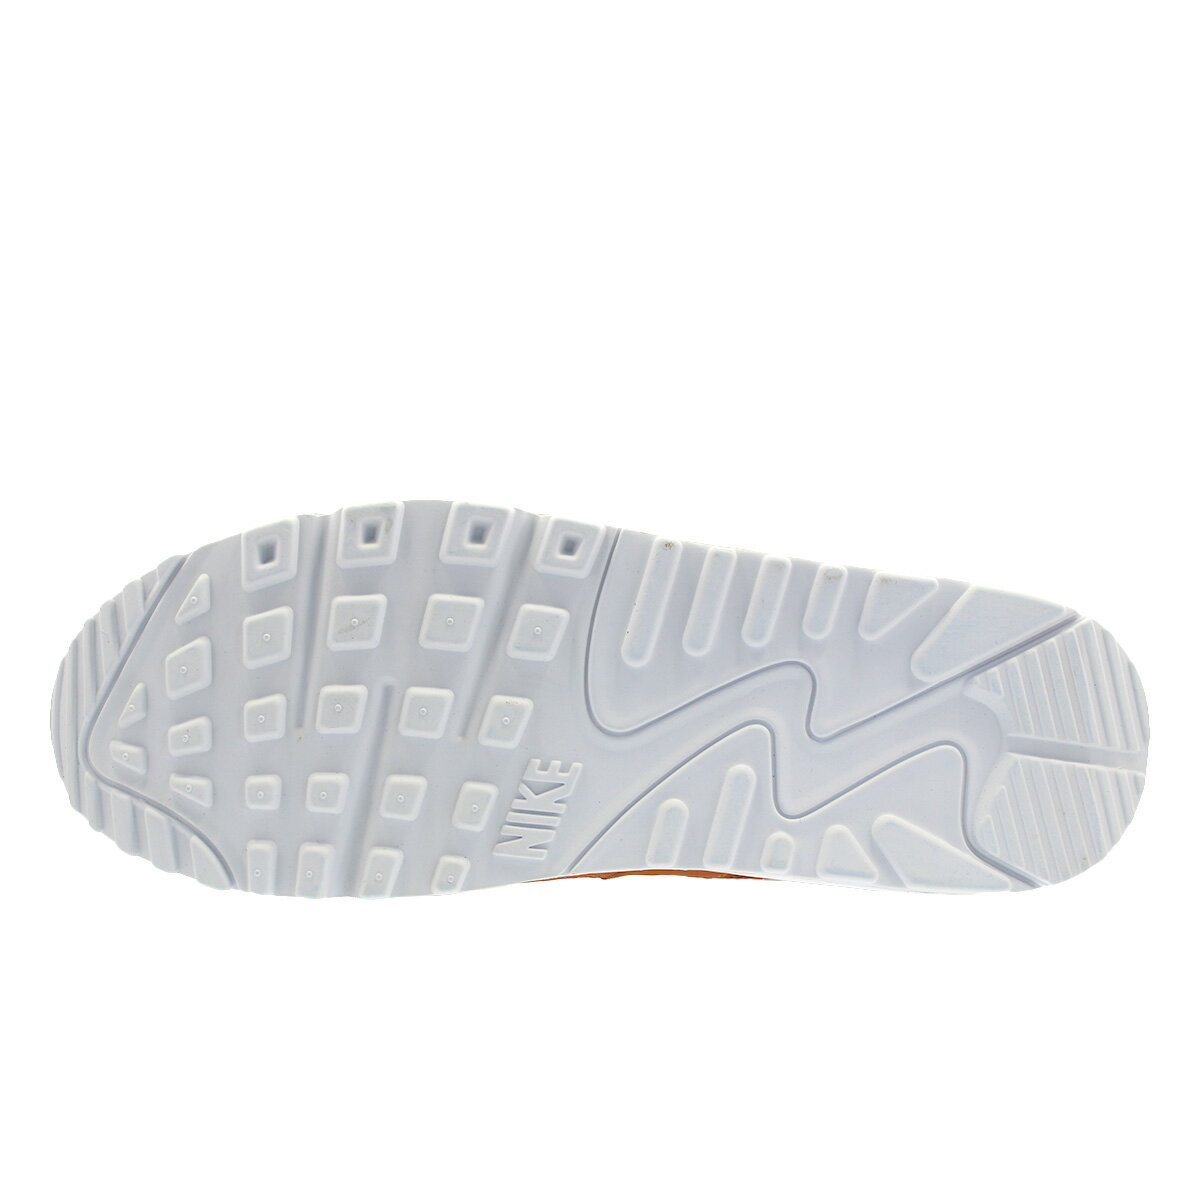 Nike Air Max 90 Dark Russet AJ1285 203 Release Date SBD